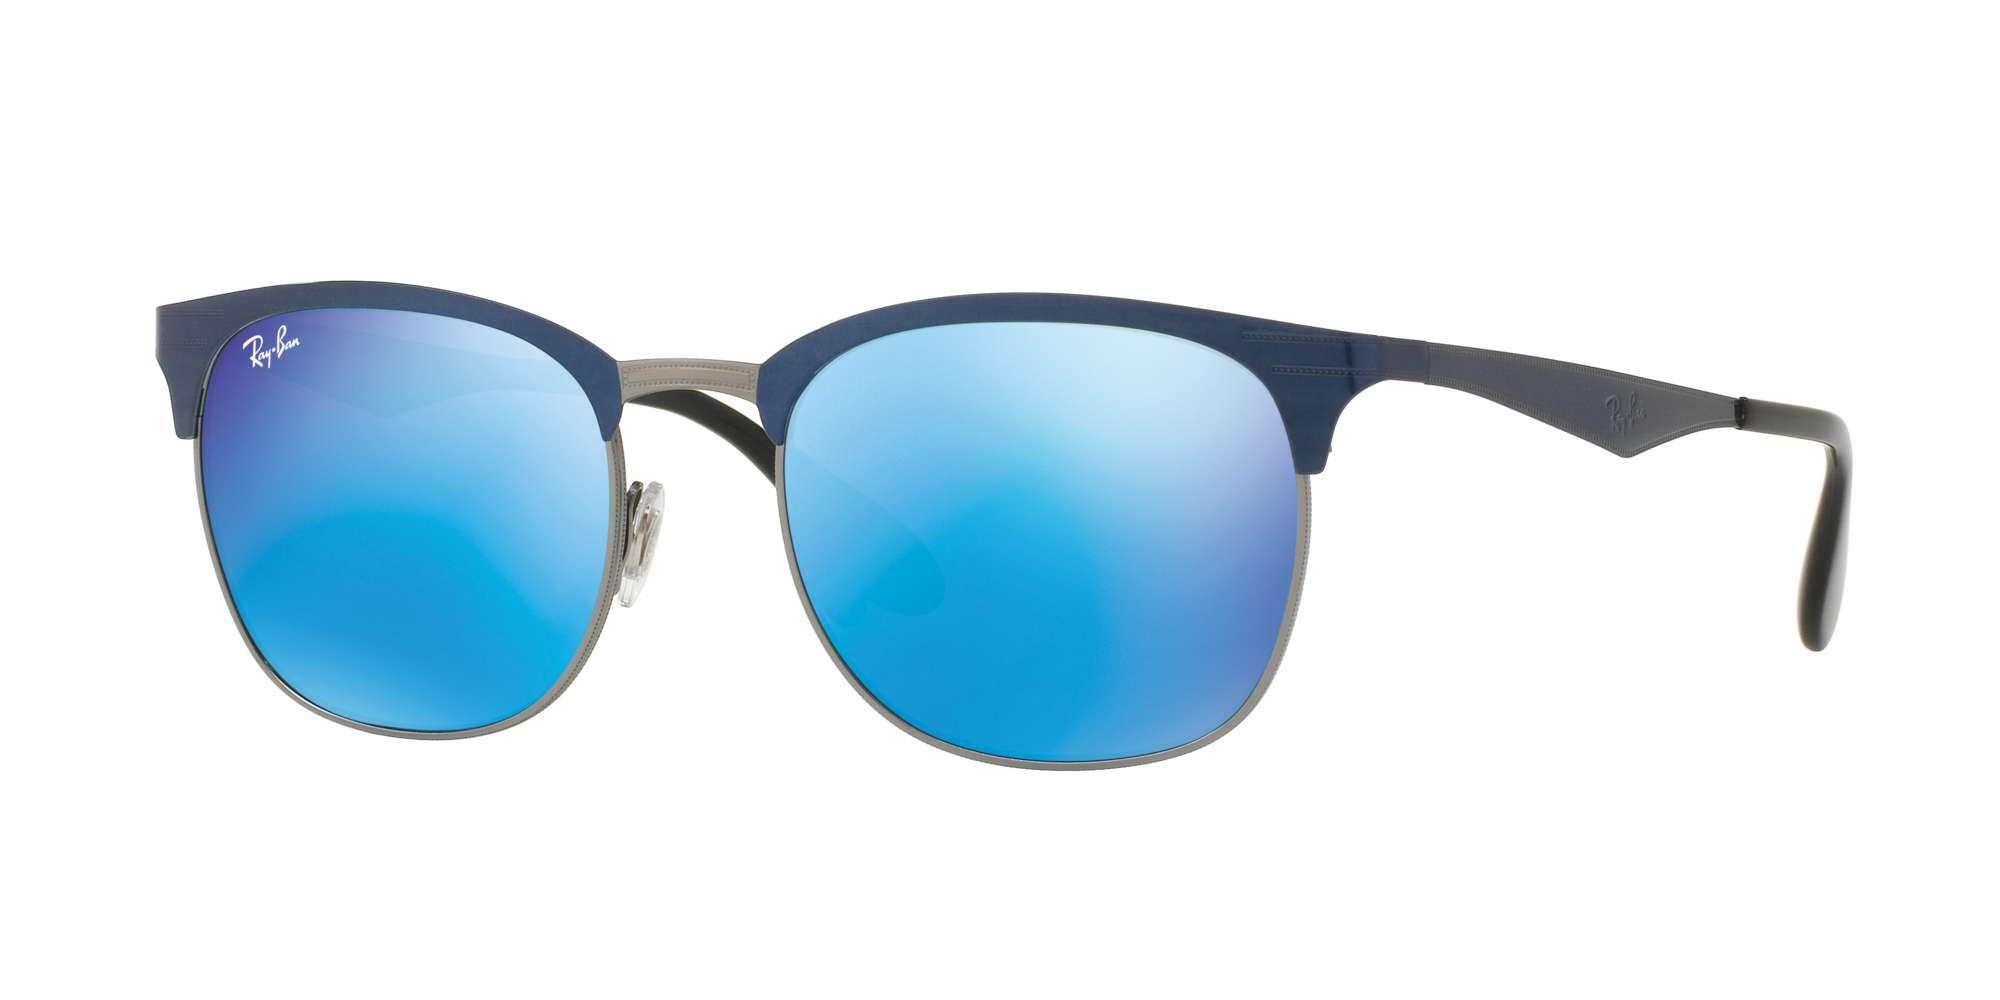 Top Blue On Gunmetal / Green Mirror Blue lenses